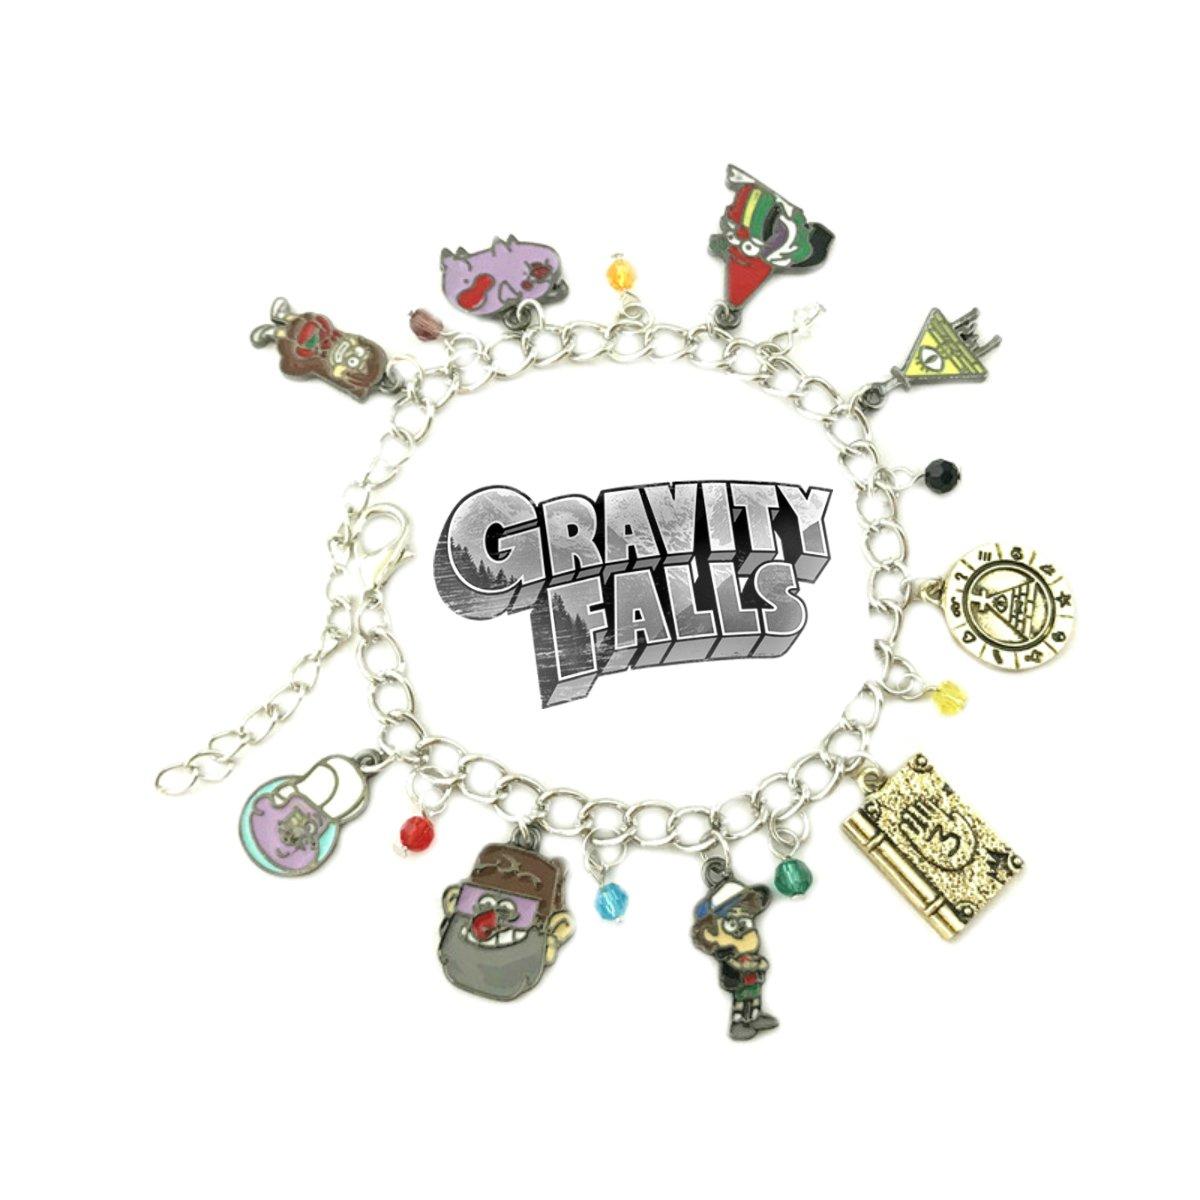 Gravity Falls Cartoon Theme Multi Charms Jewelry Bracelets Charm by Family Brands